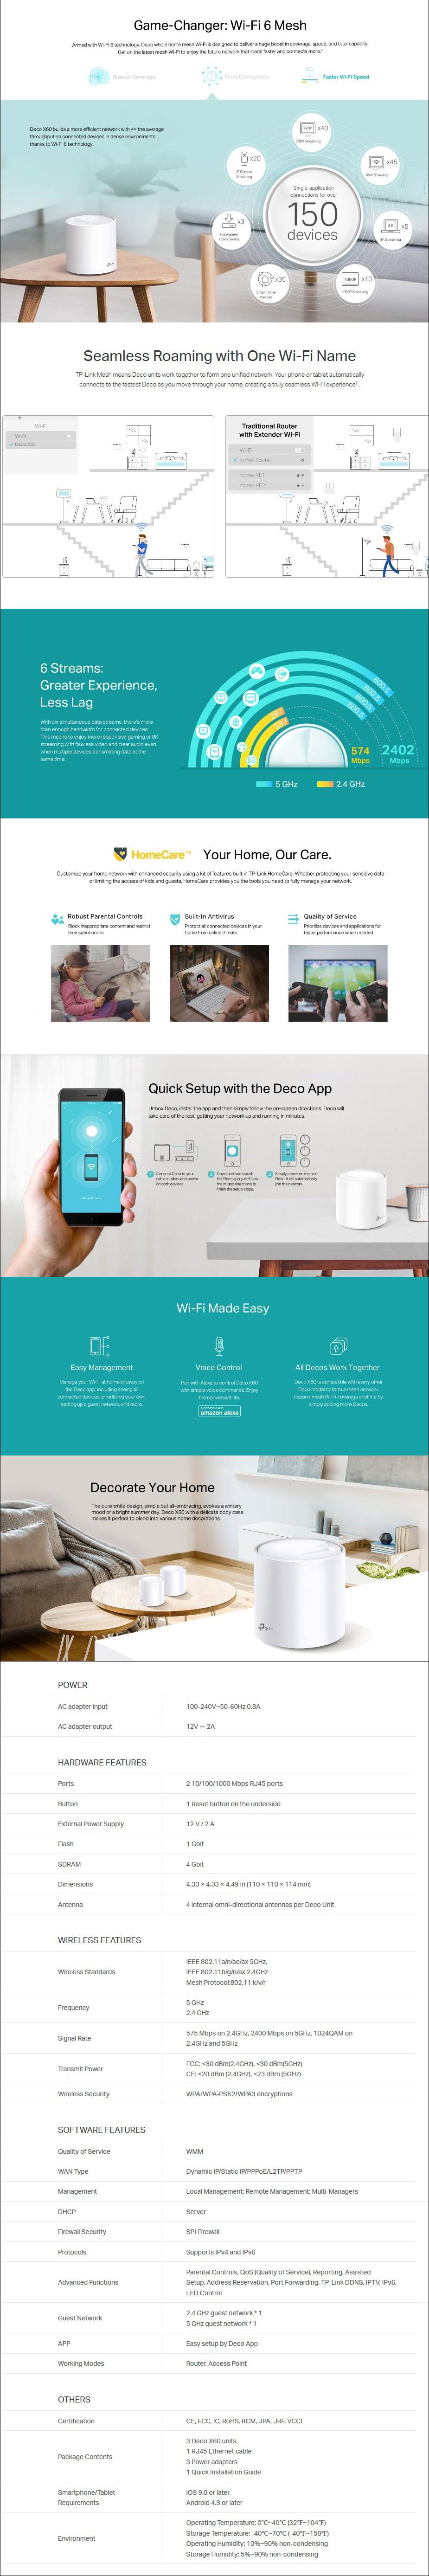 tplink-deco-x60-ax3000-awhole-home-mesh-wifi-system-2pack-ac38344-3-1-.jpg